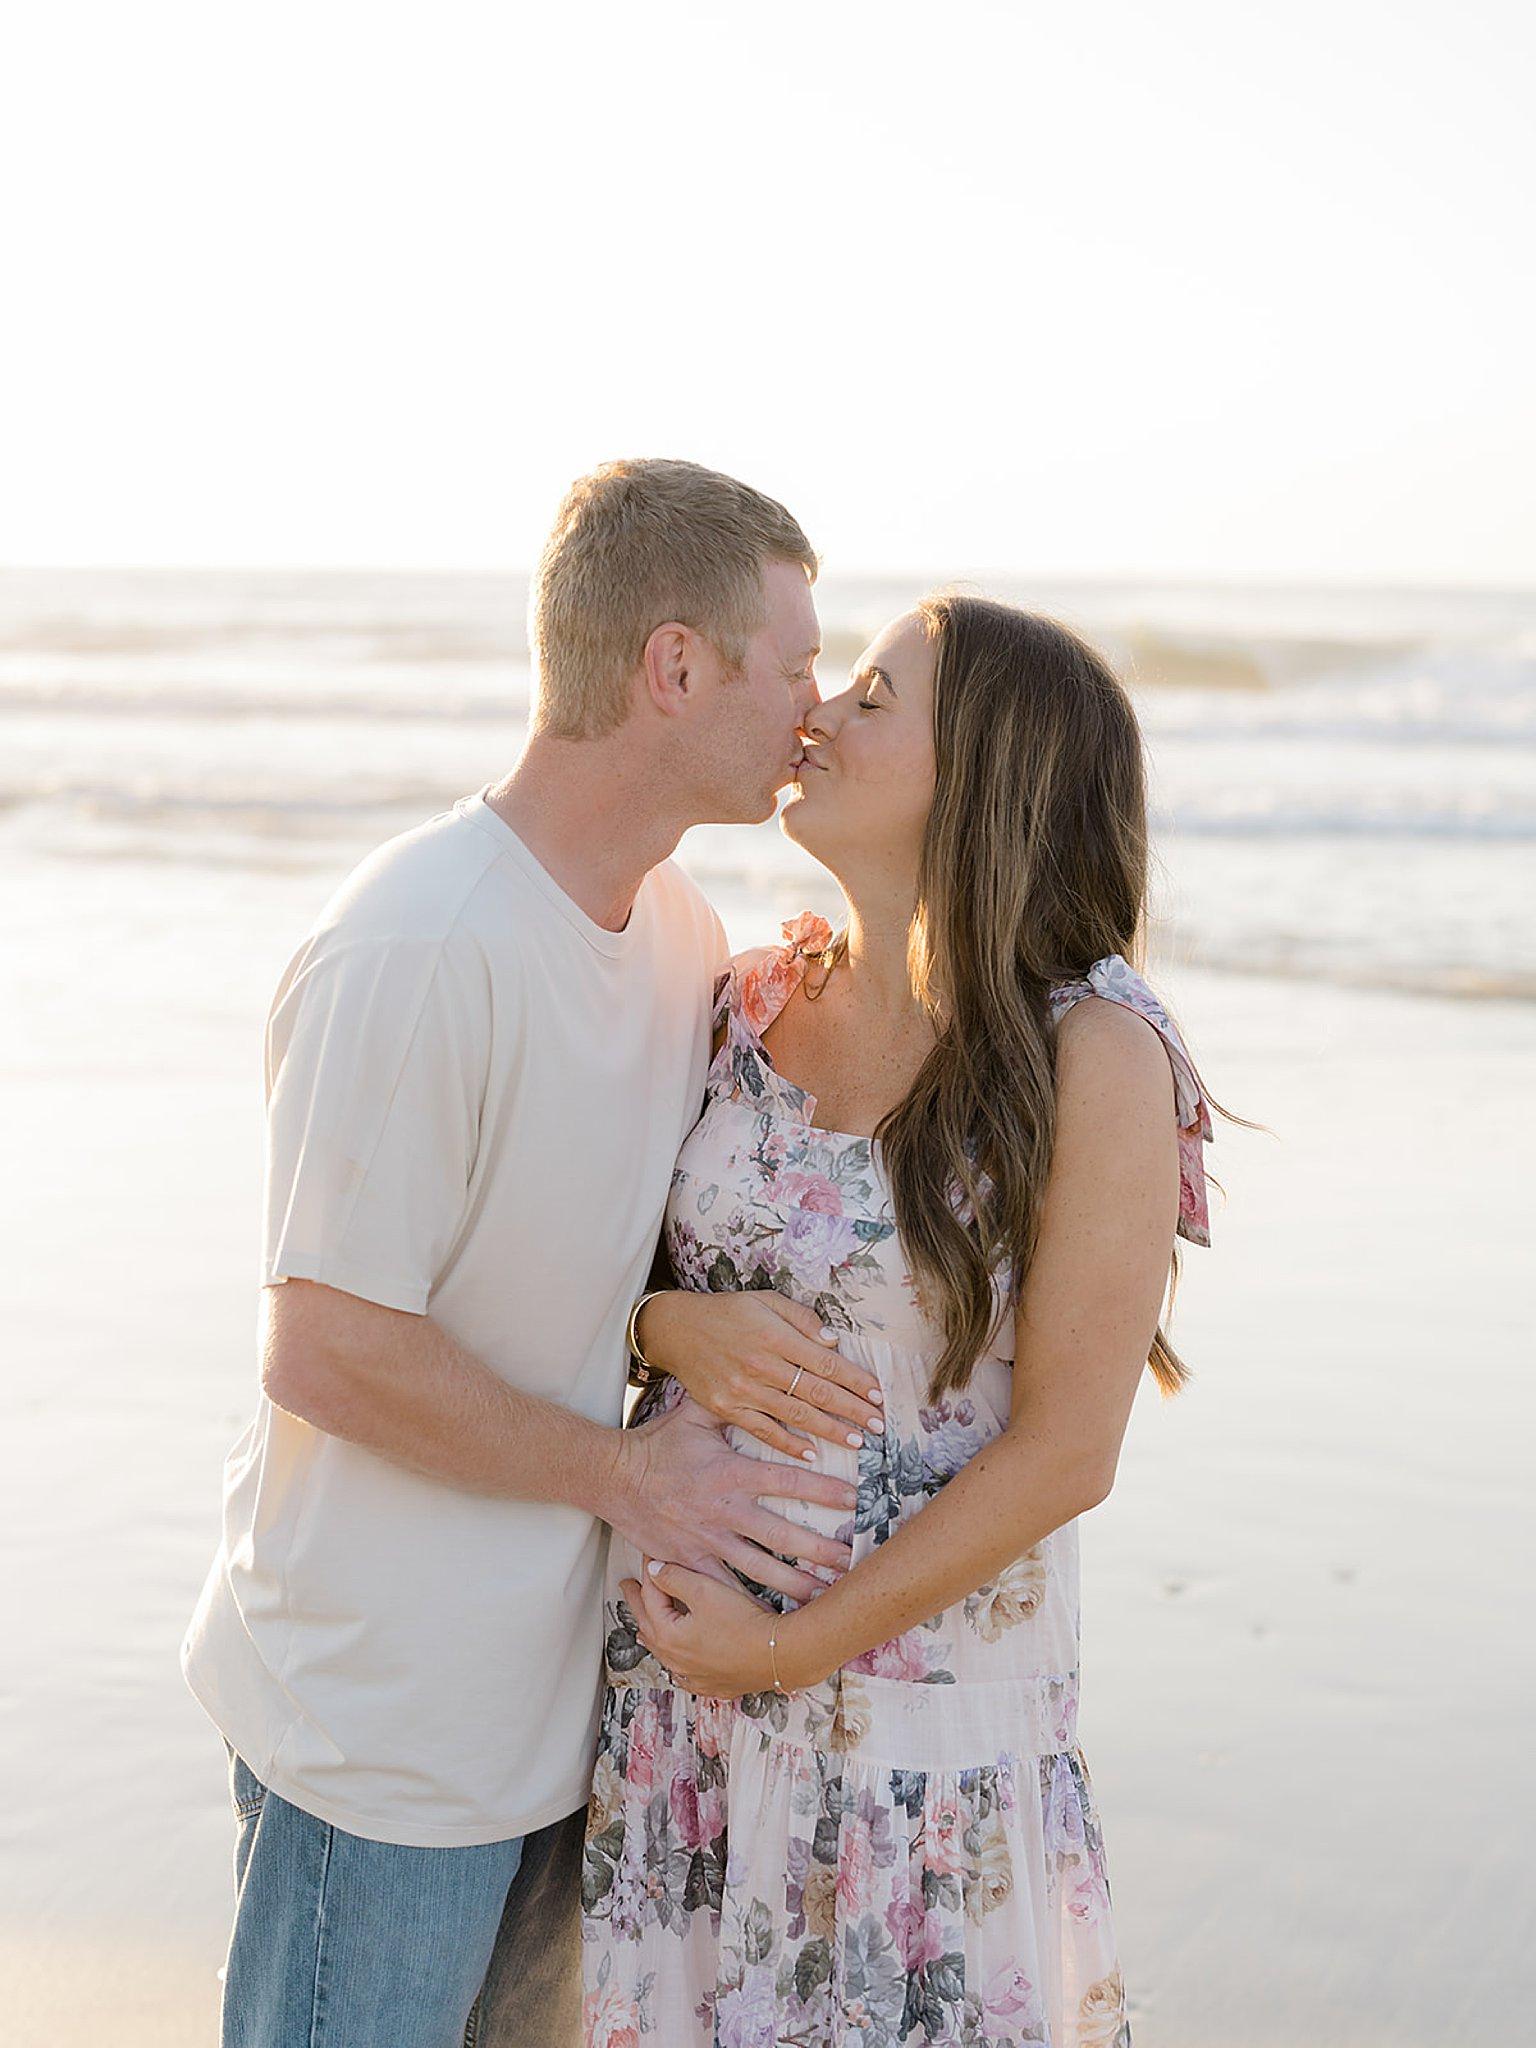 Ocean City NJ Gender Reveal Pregnancy Photography by Magdalena Studios 0021